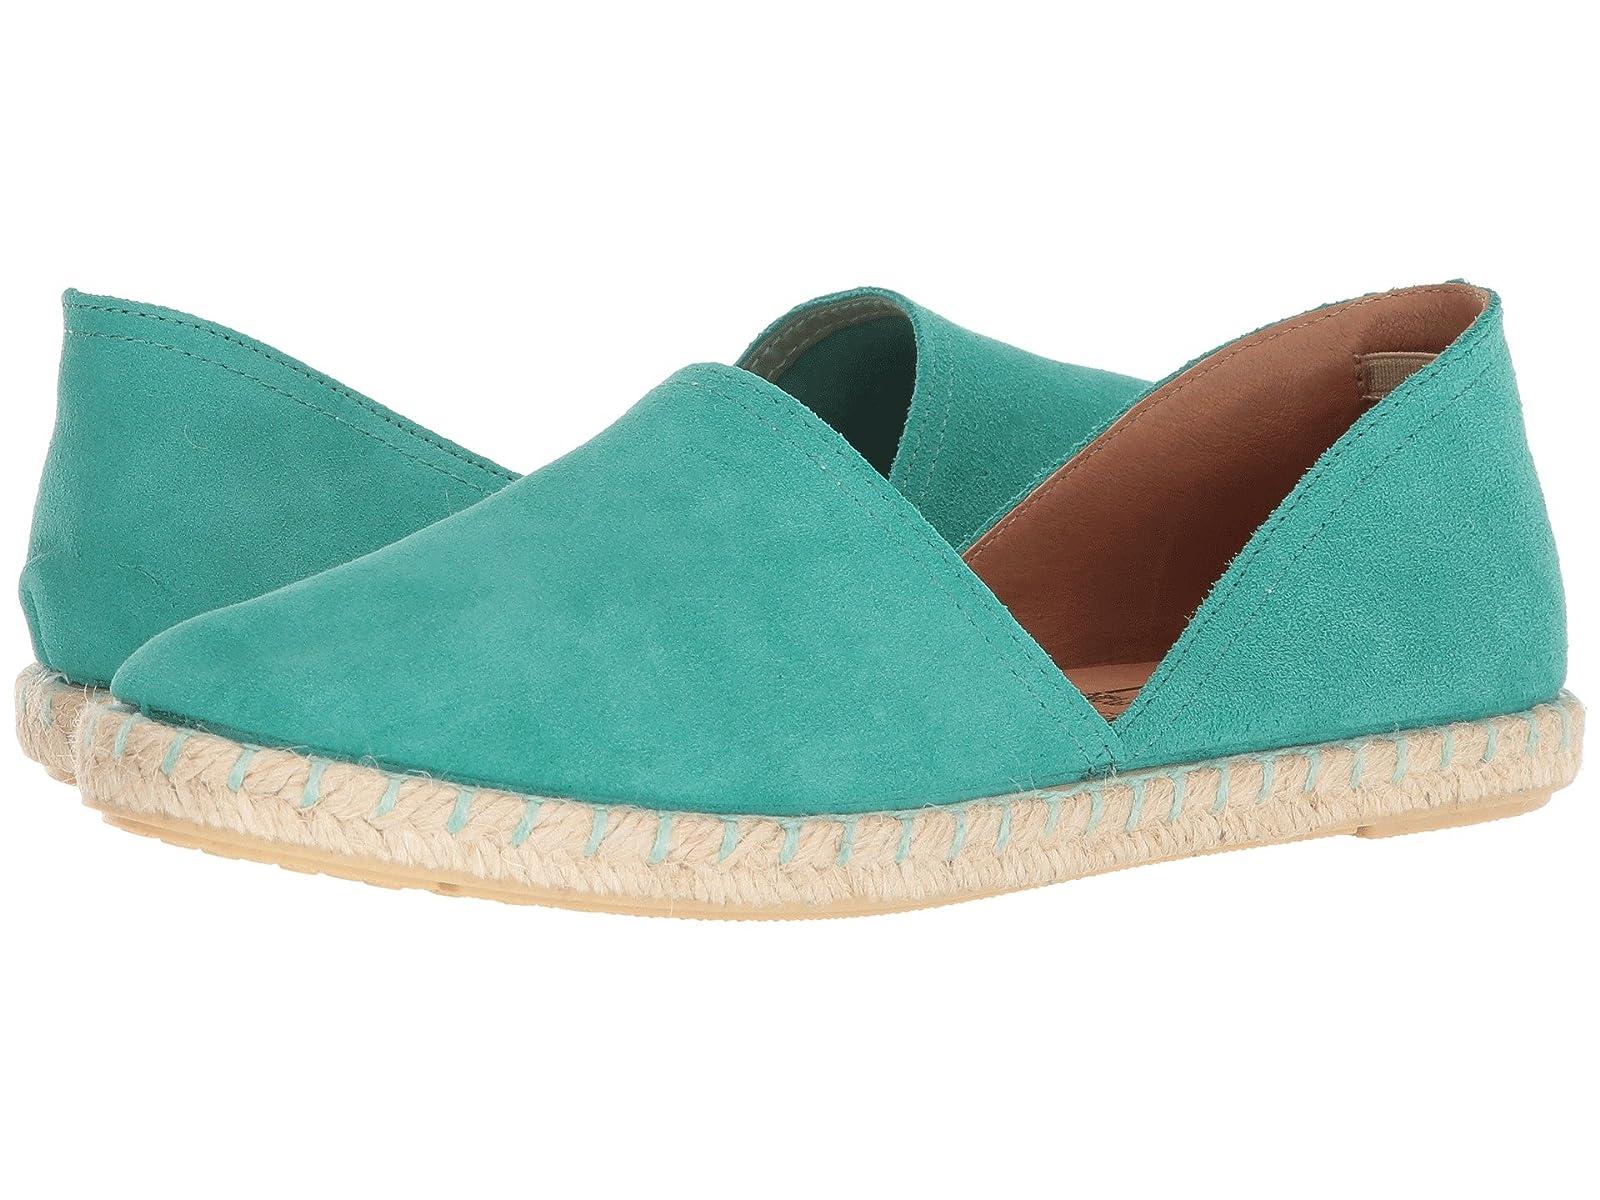 Miz Mooz CelestineAtmospheric grades have affordable shoes